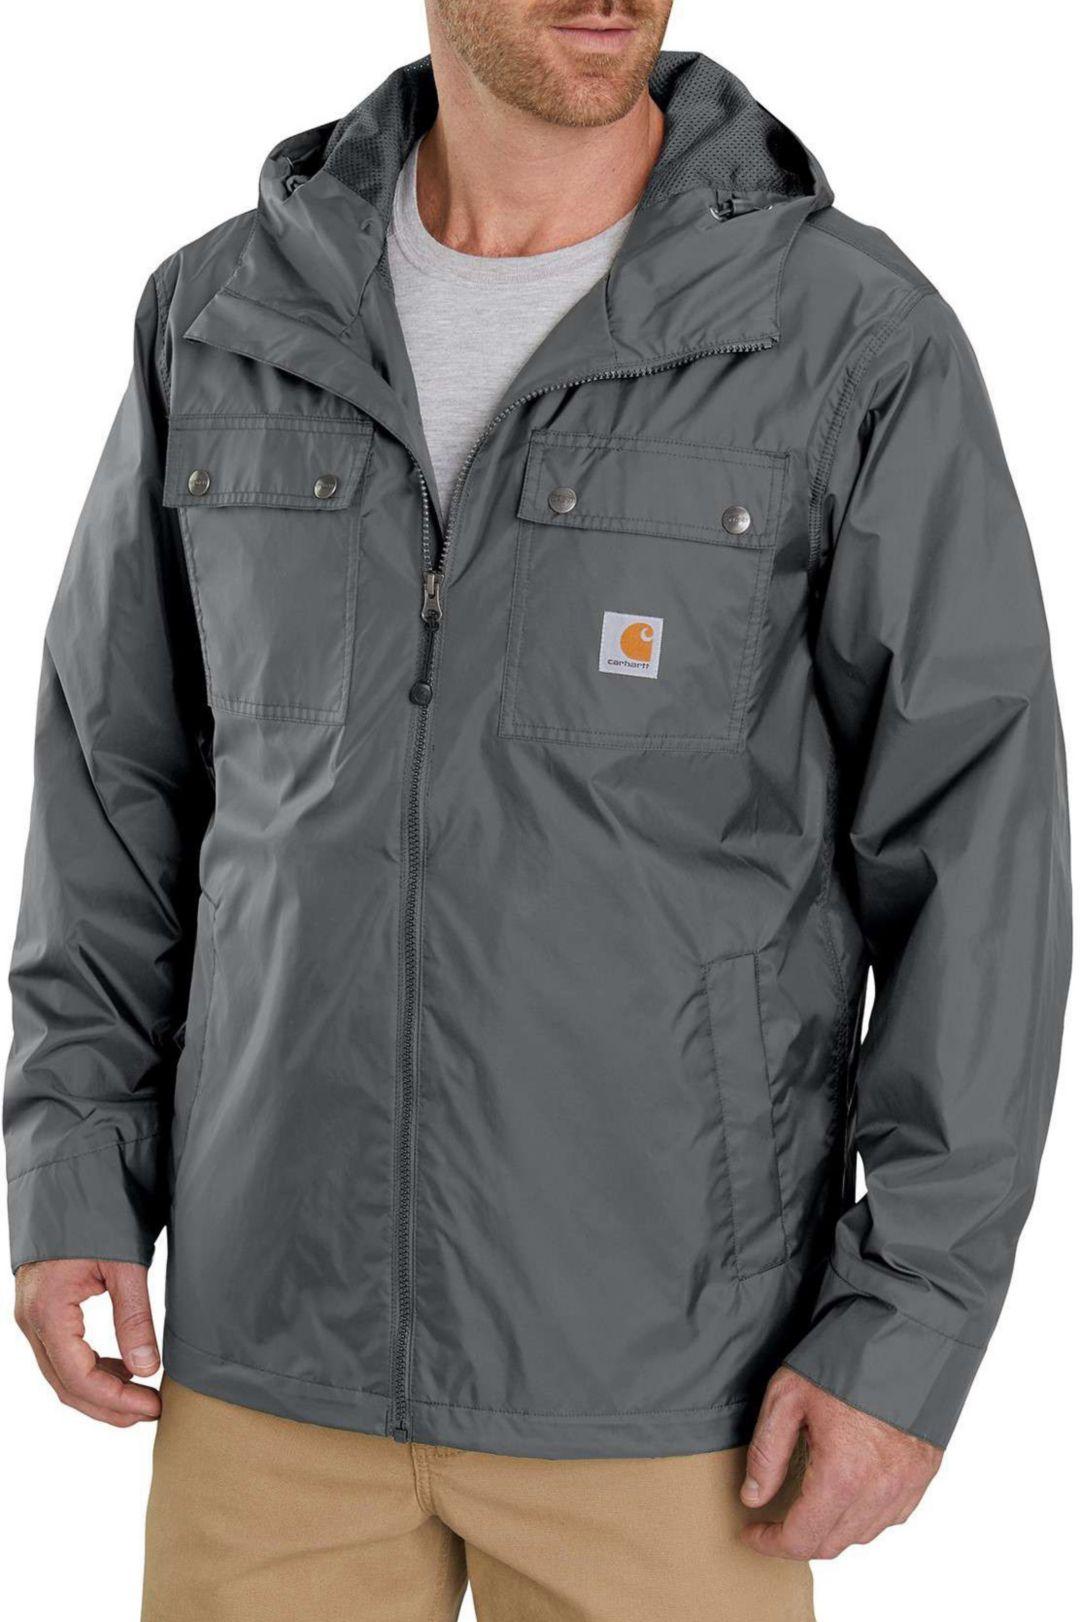 ac80fe255a8ce8 Carhartt Men's Rockford Jacket | DICK'S Sporting Goods